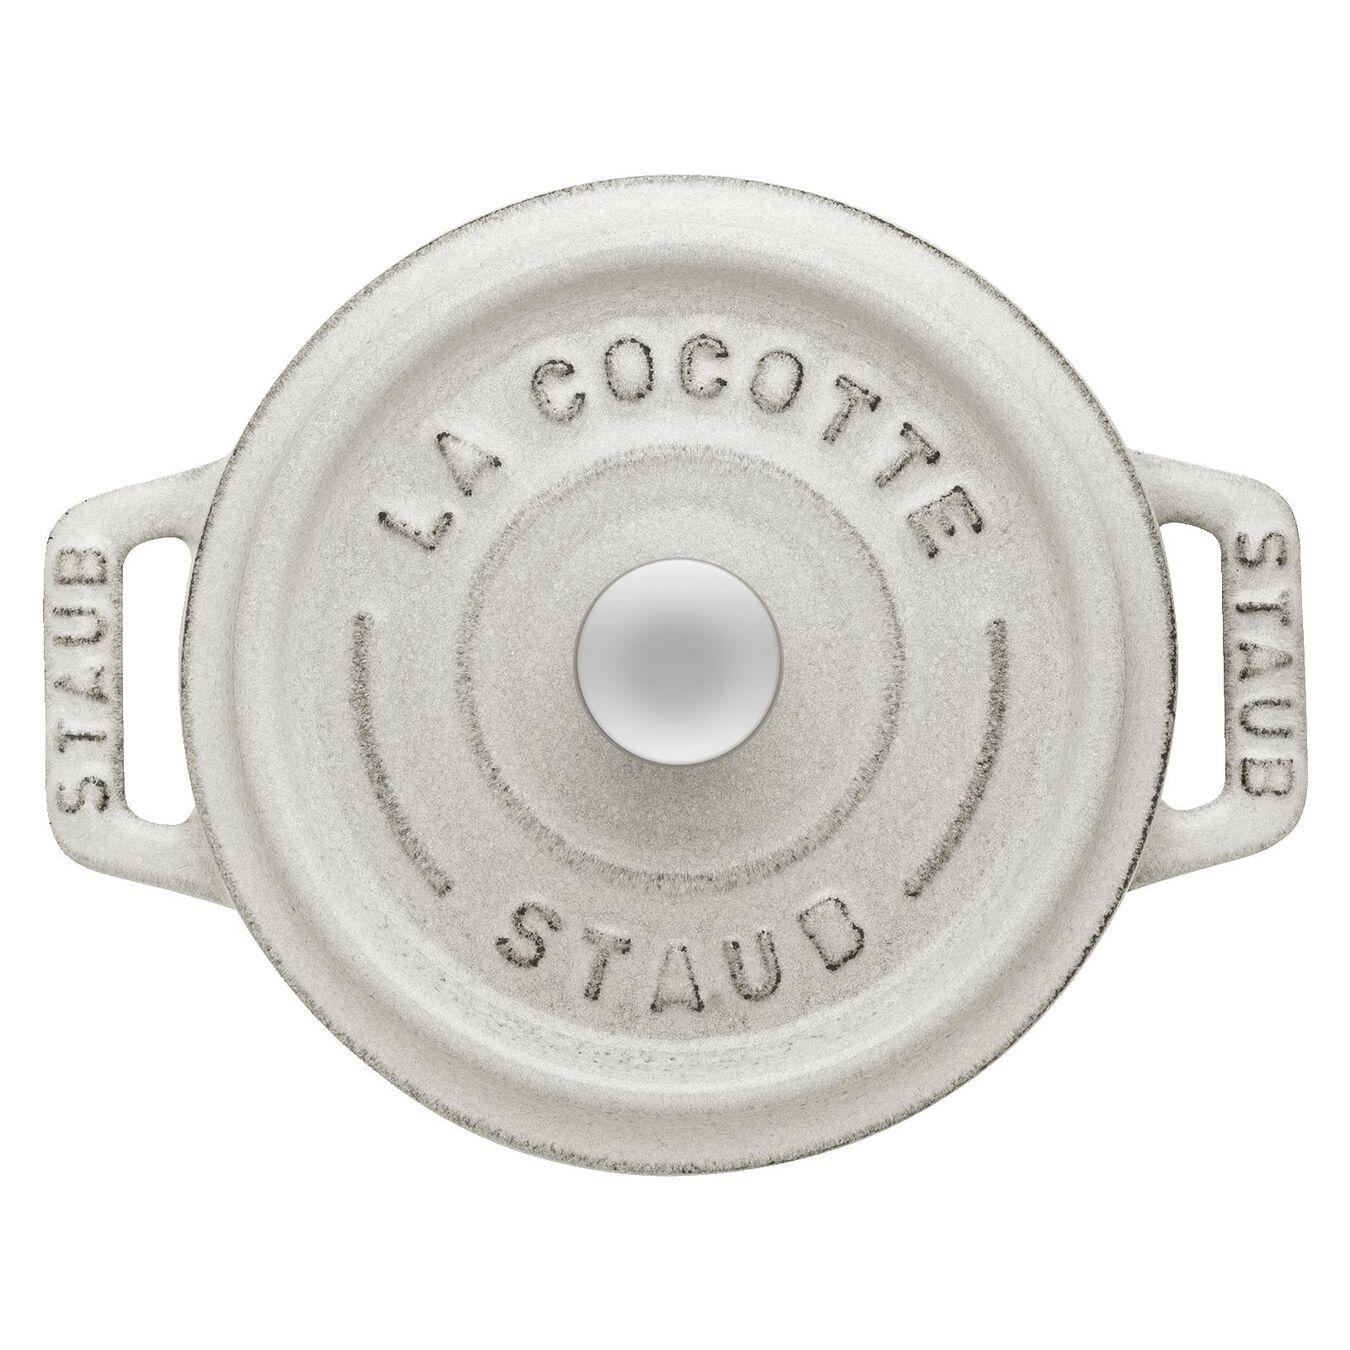 0.275 qt, Mini Cocotte, white truffle - Visual Imperfections,,large 3